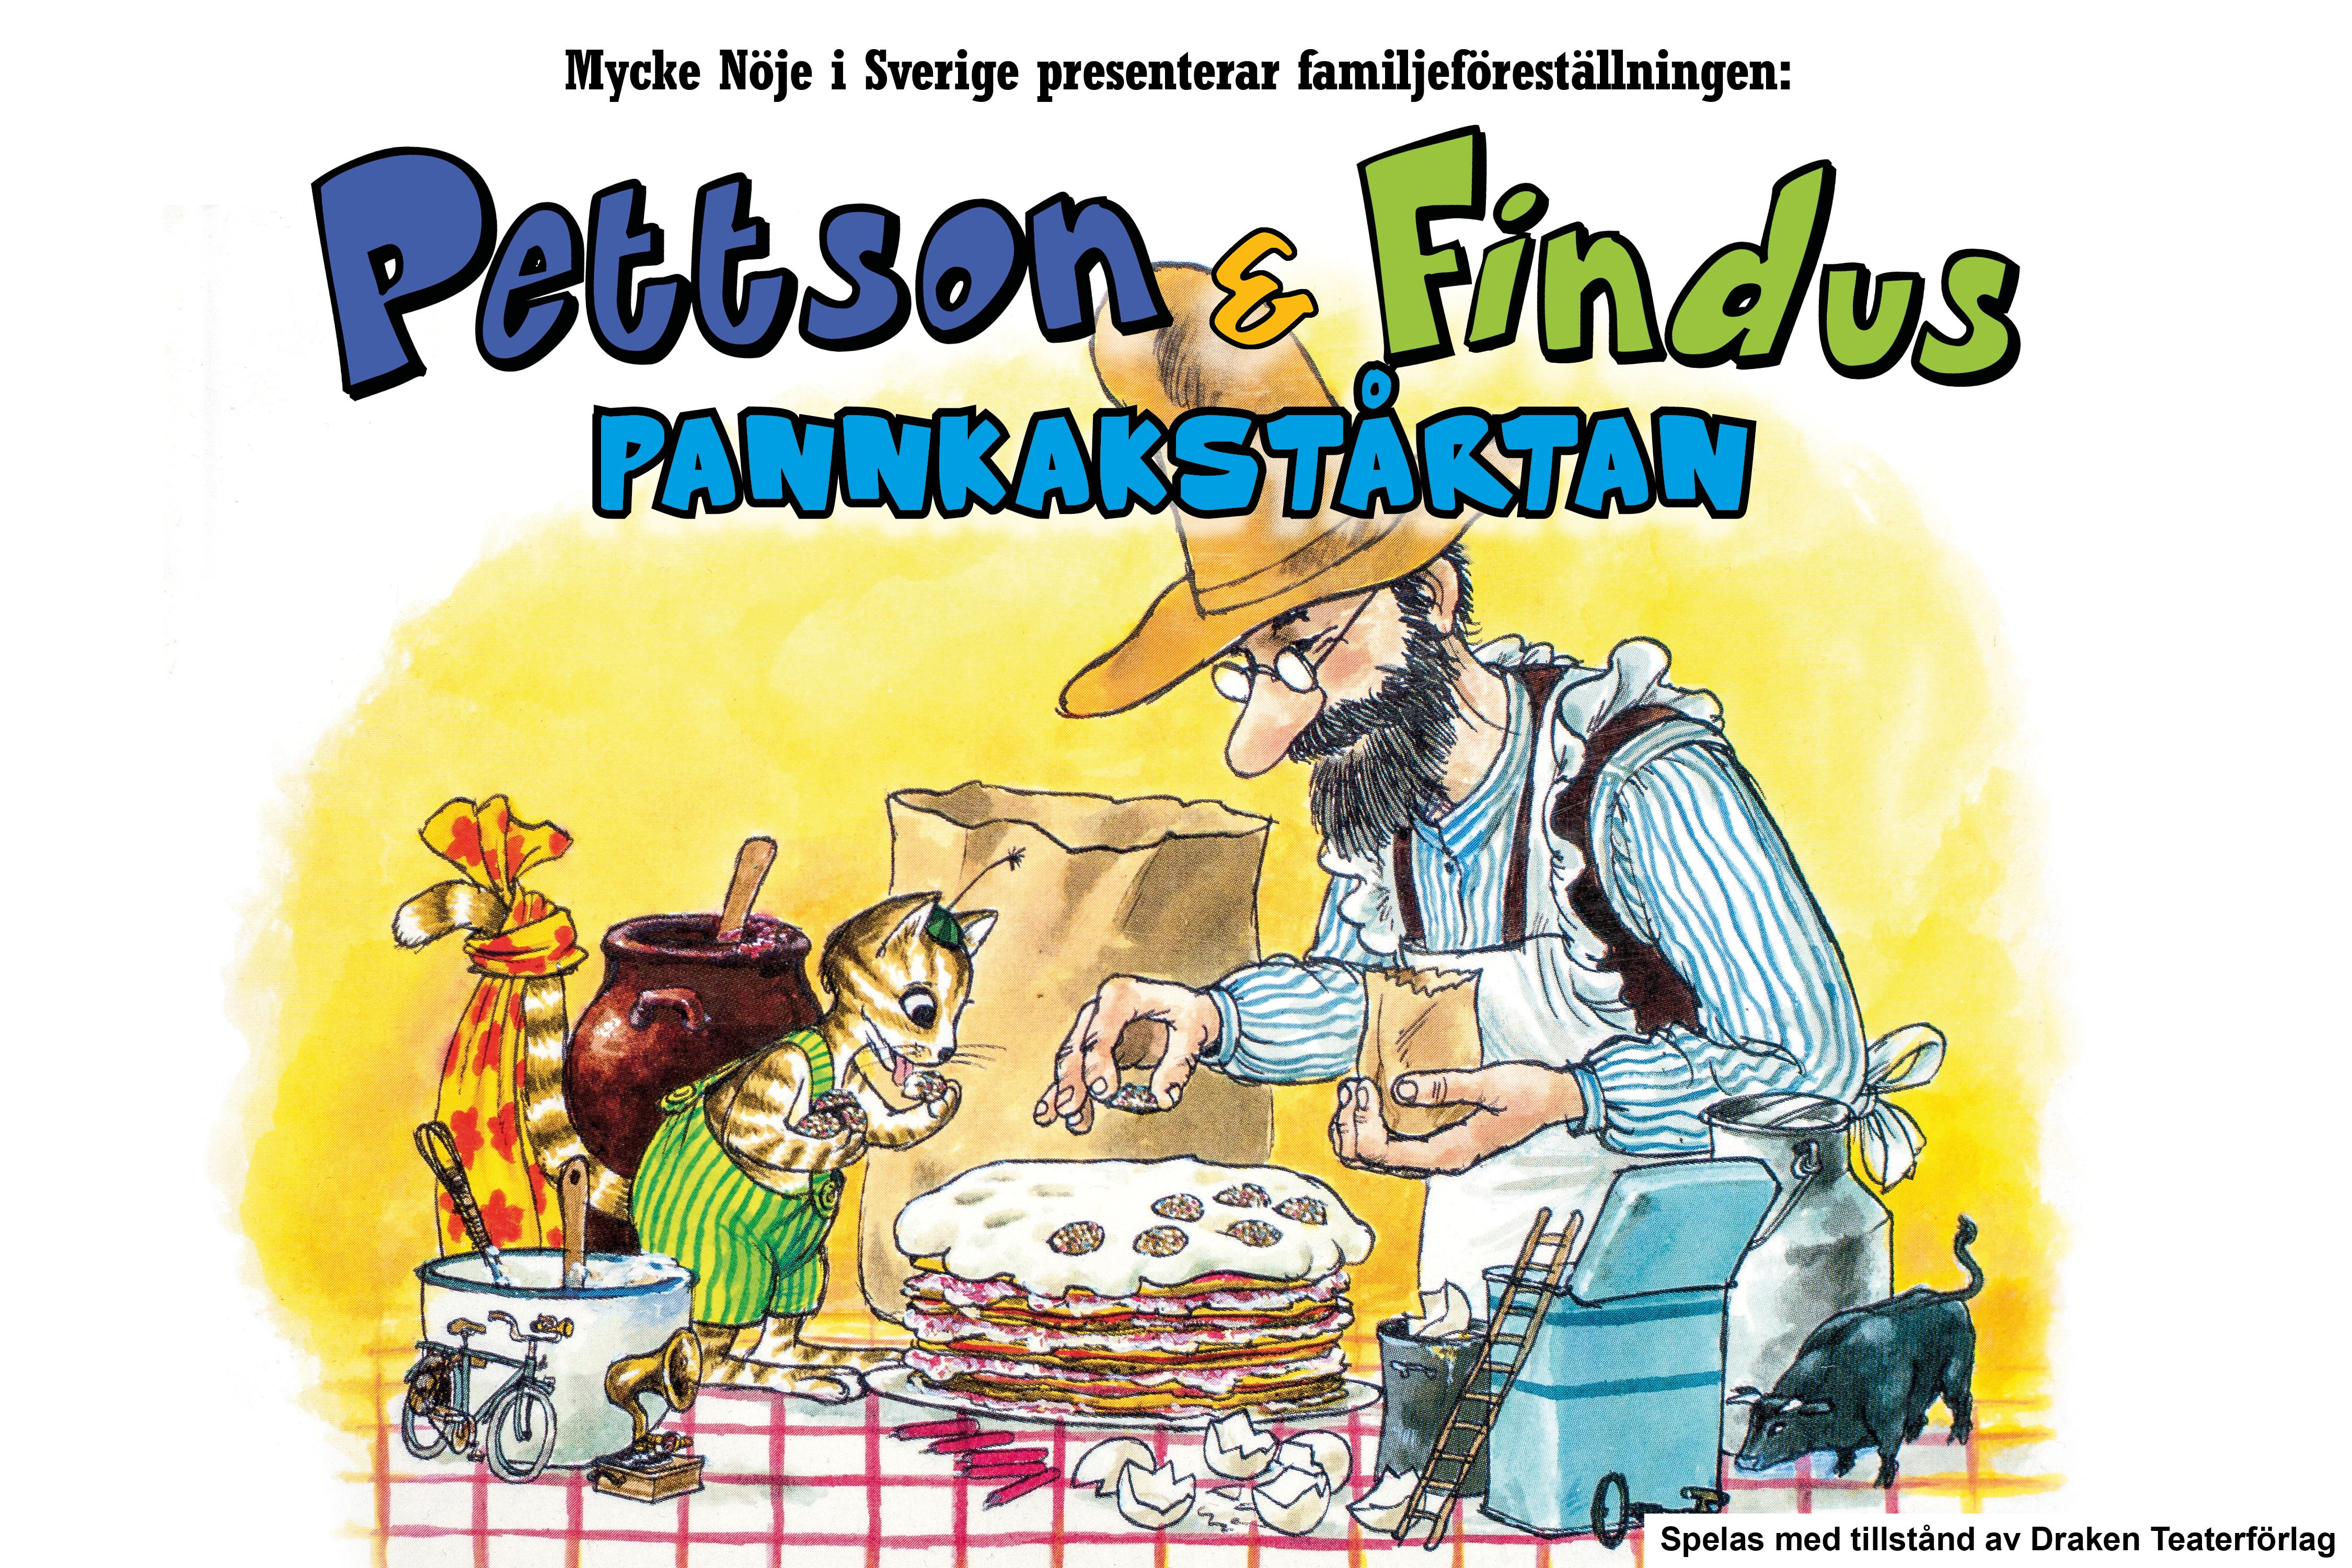 © Mycke Nöje i Sverige AB, Barnteater:Pannkakstårtan